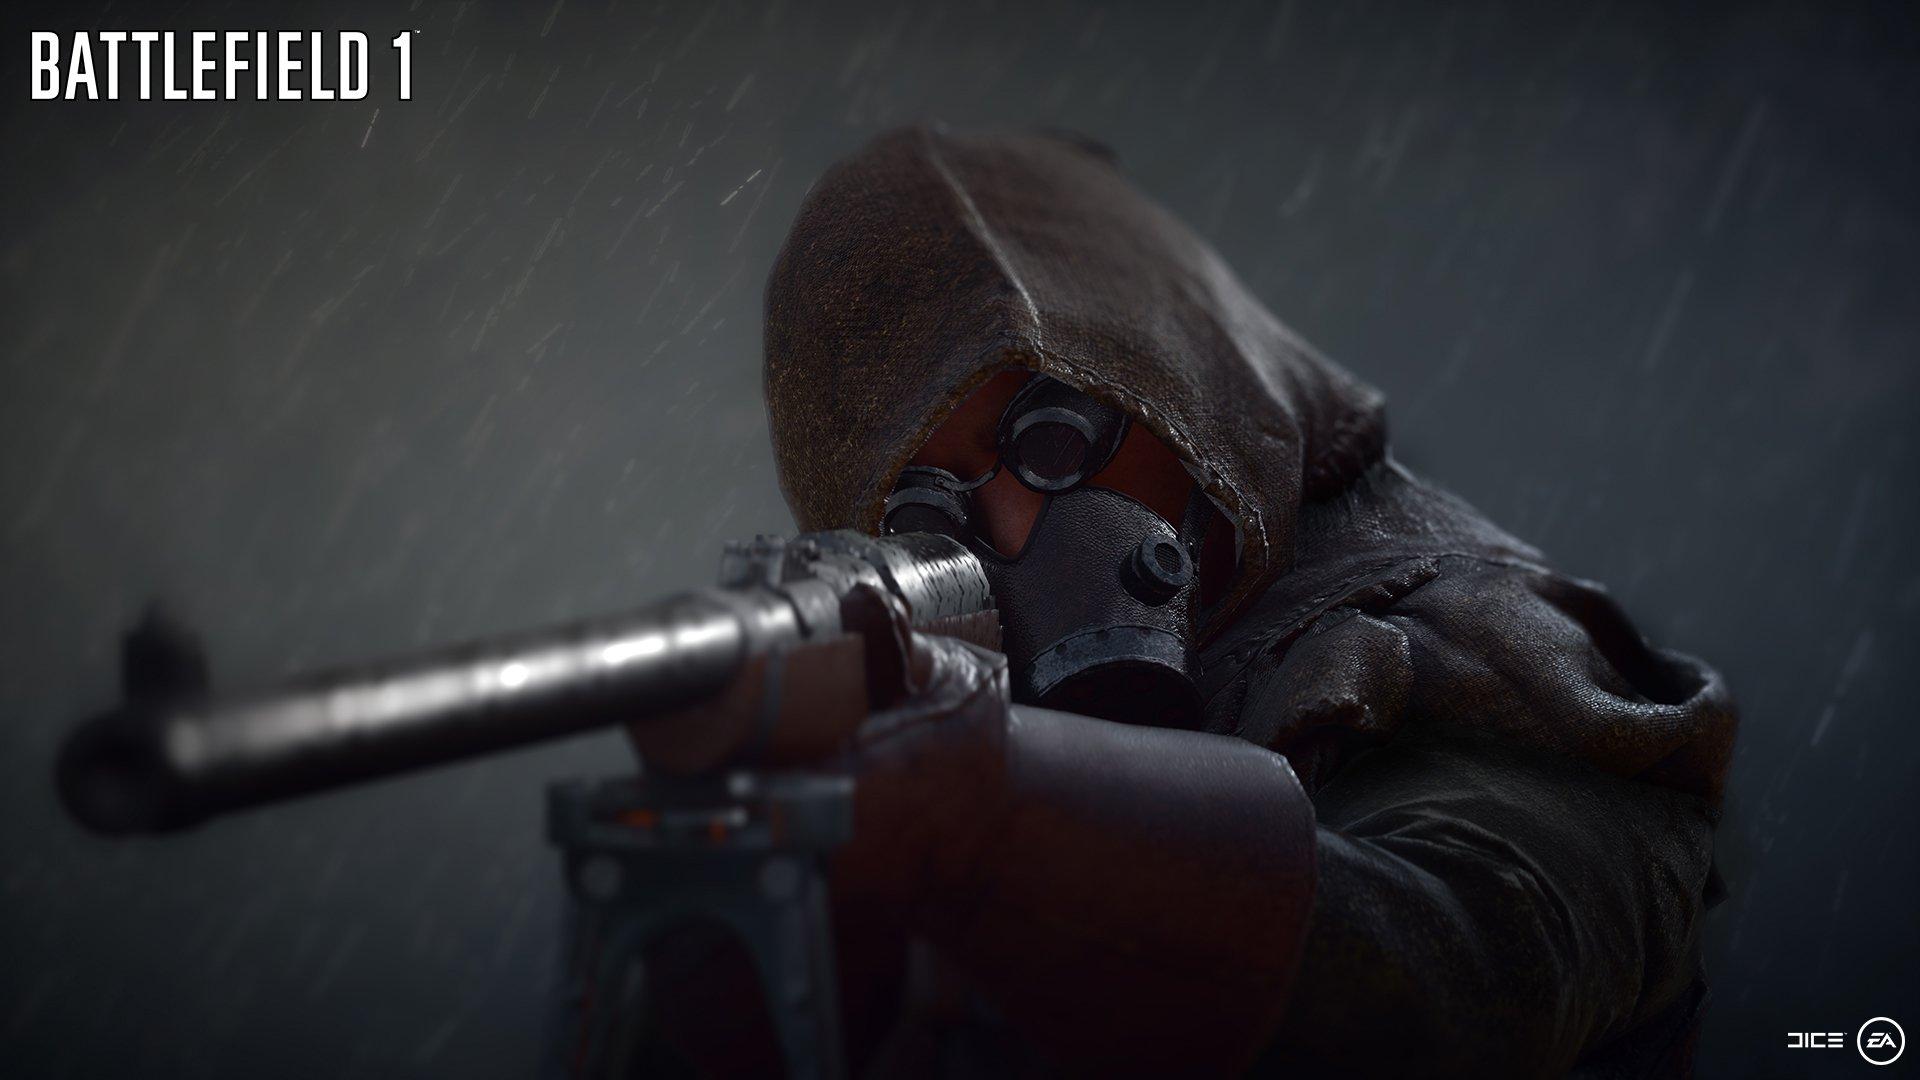 Line of Sight بخش جدید این هفتهی Battlefield 1 خواهد بود